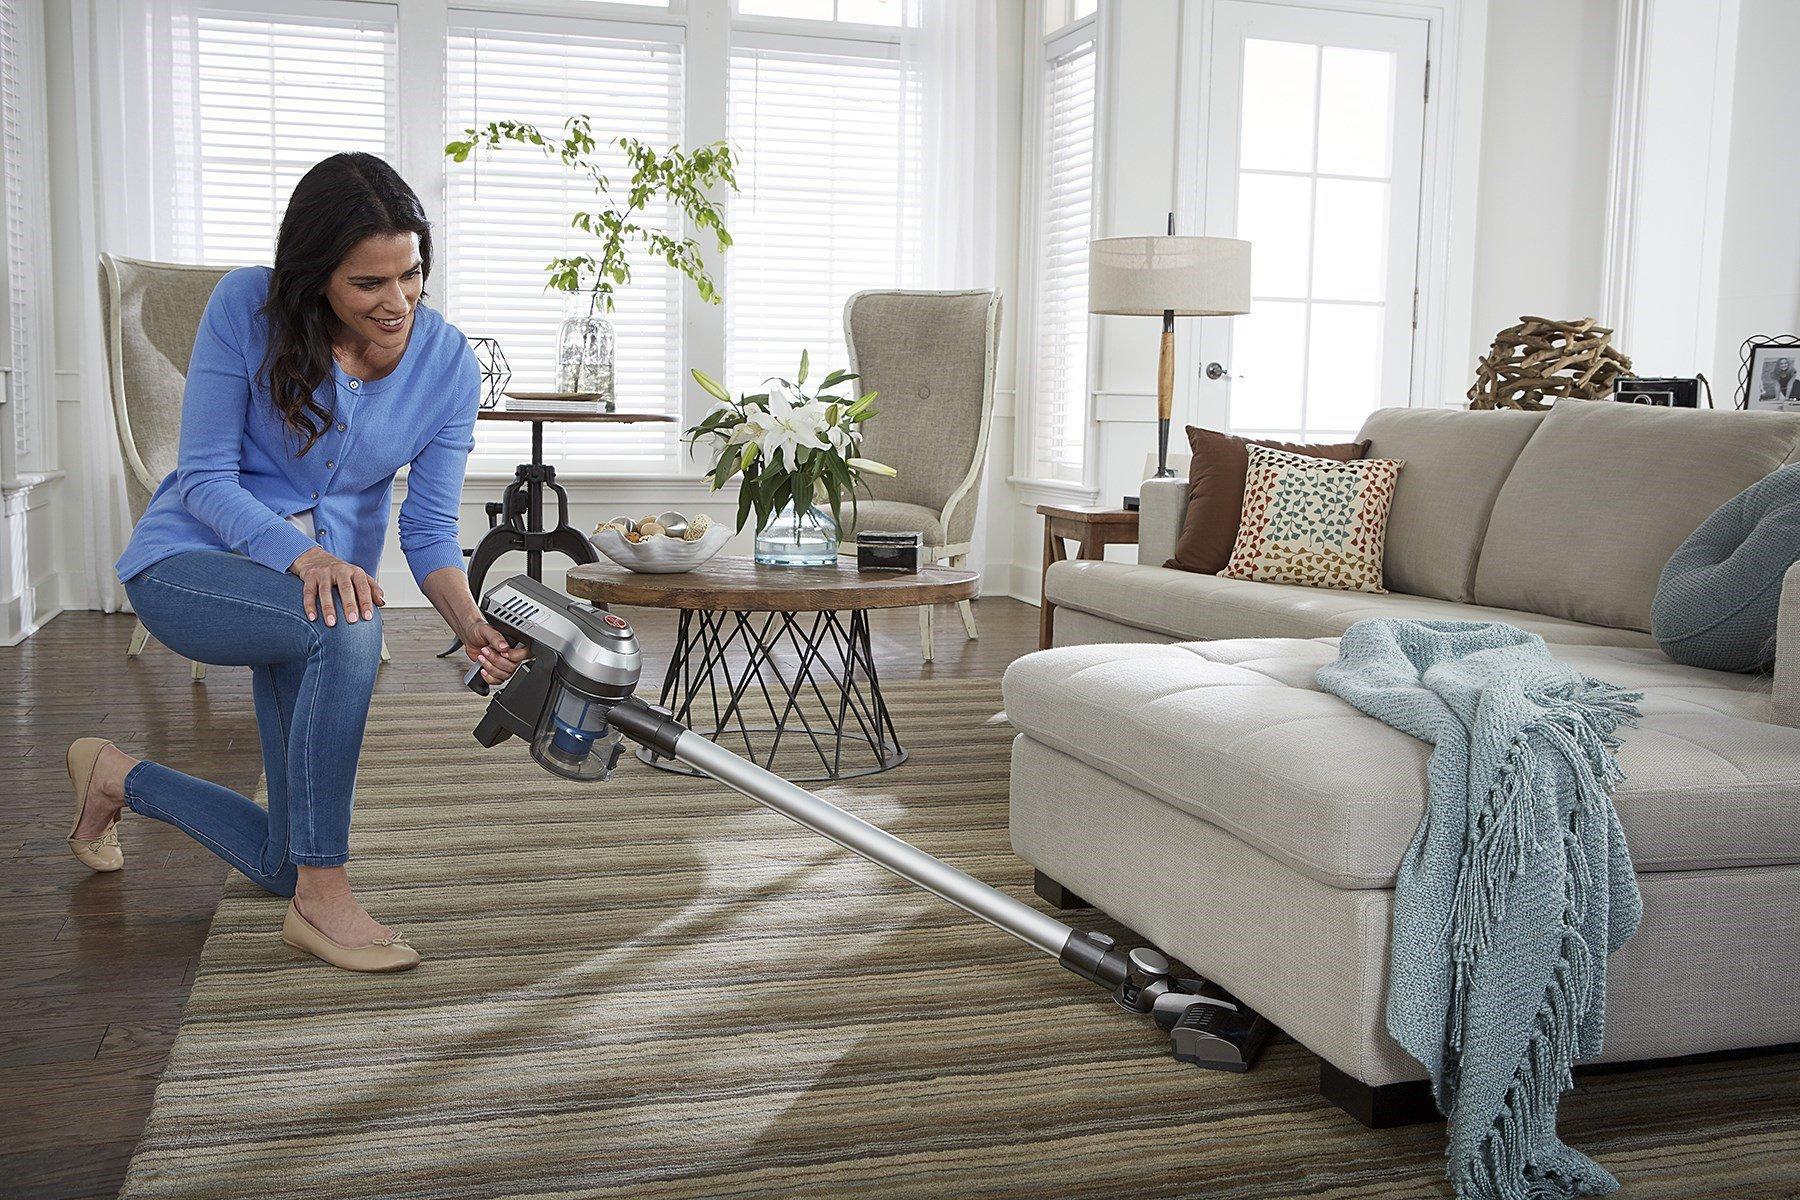 Cruise Cordless Ultra-Light Stick Vacuum4